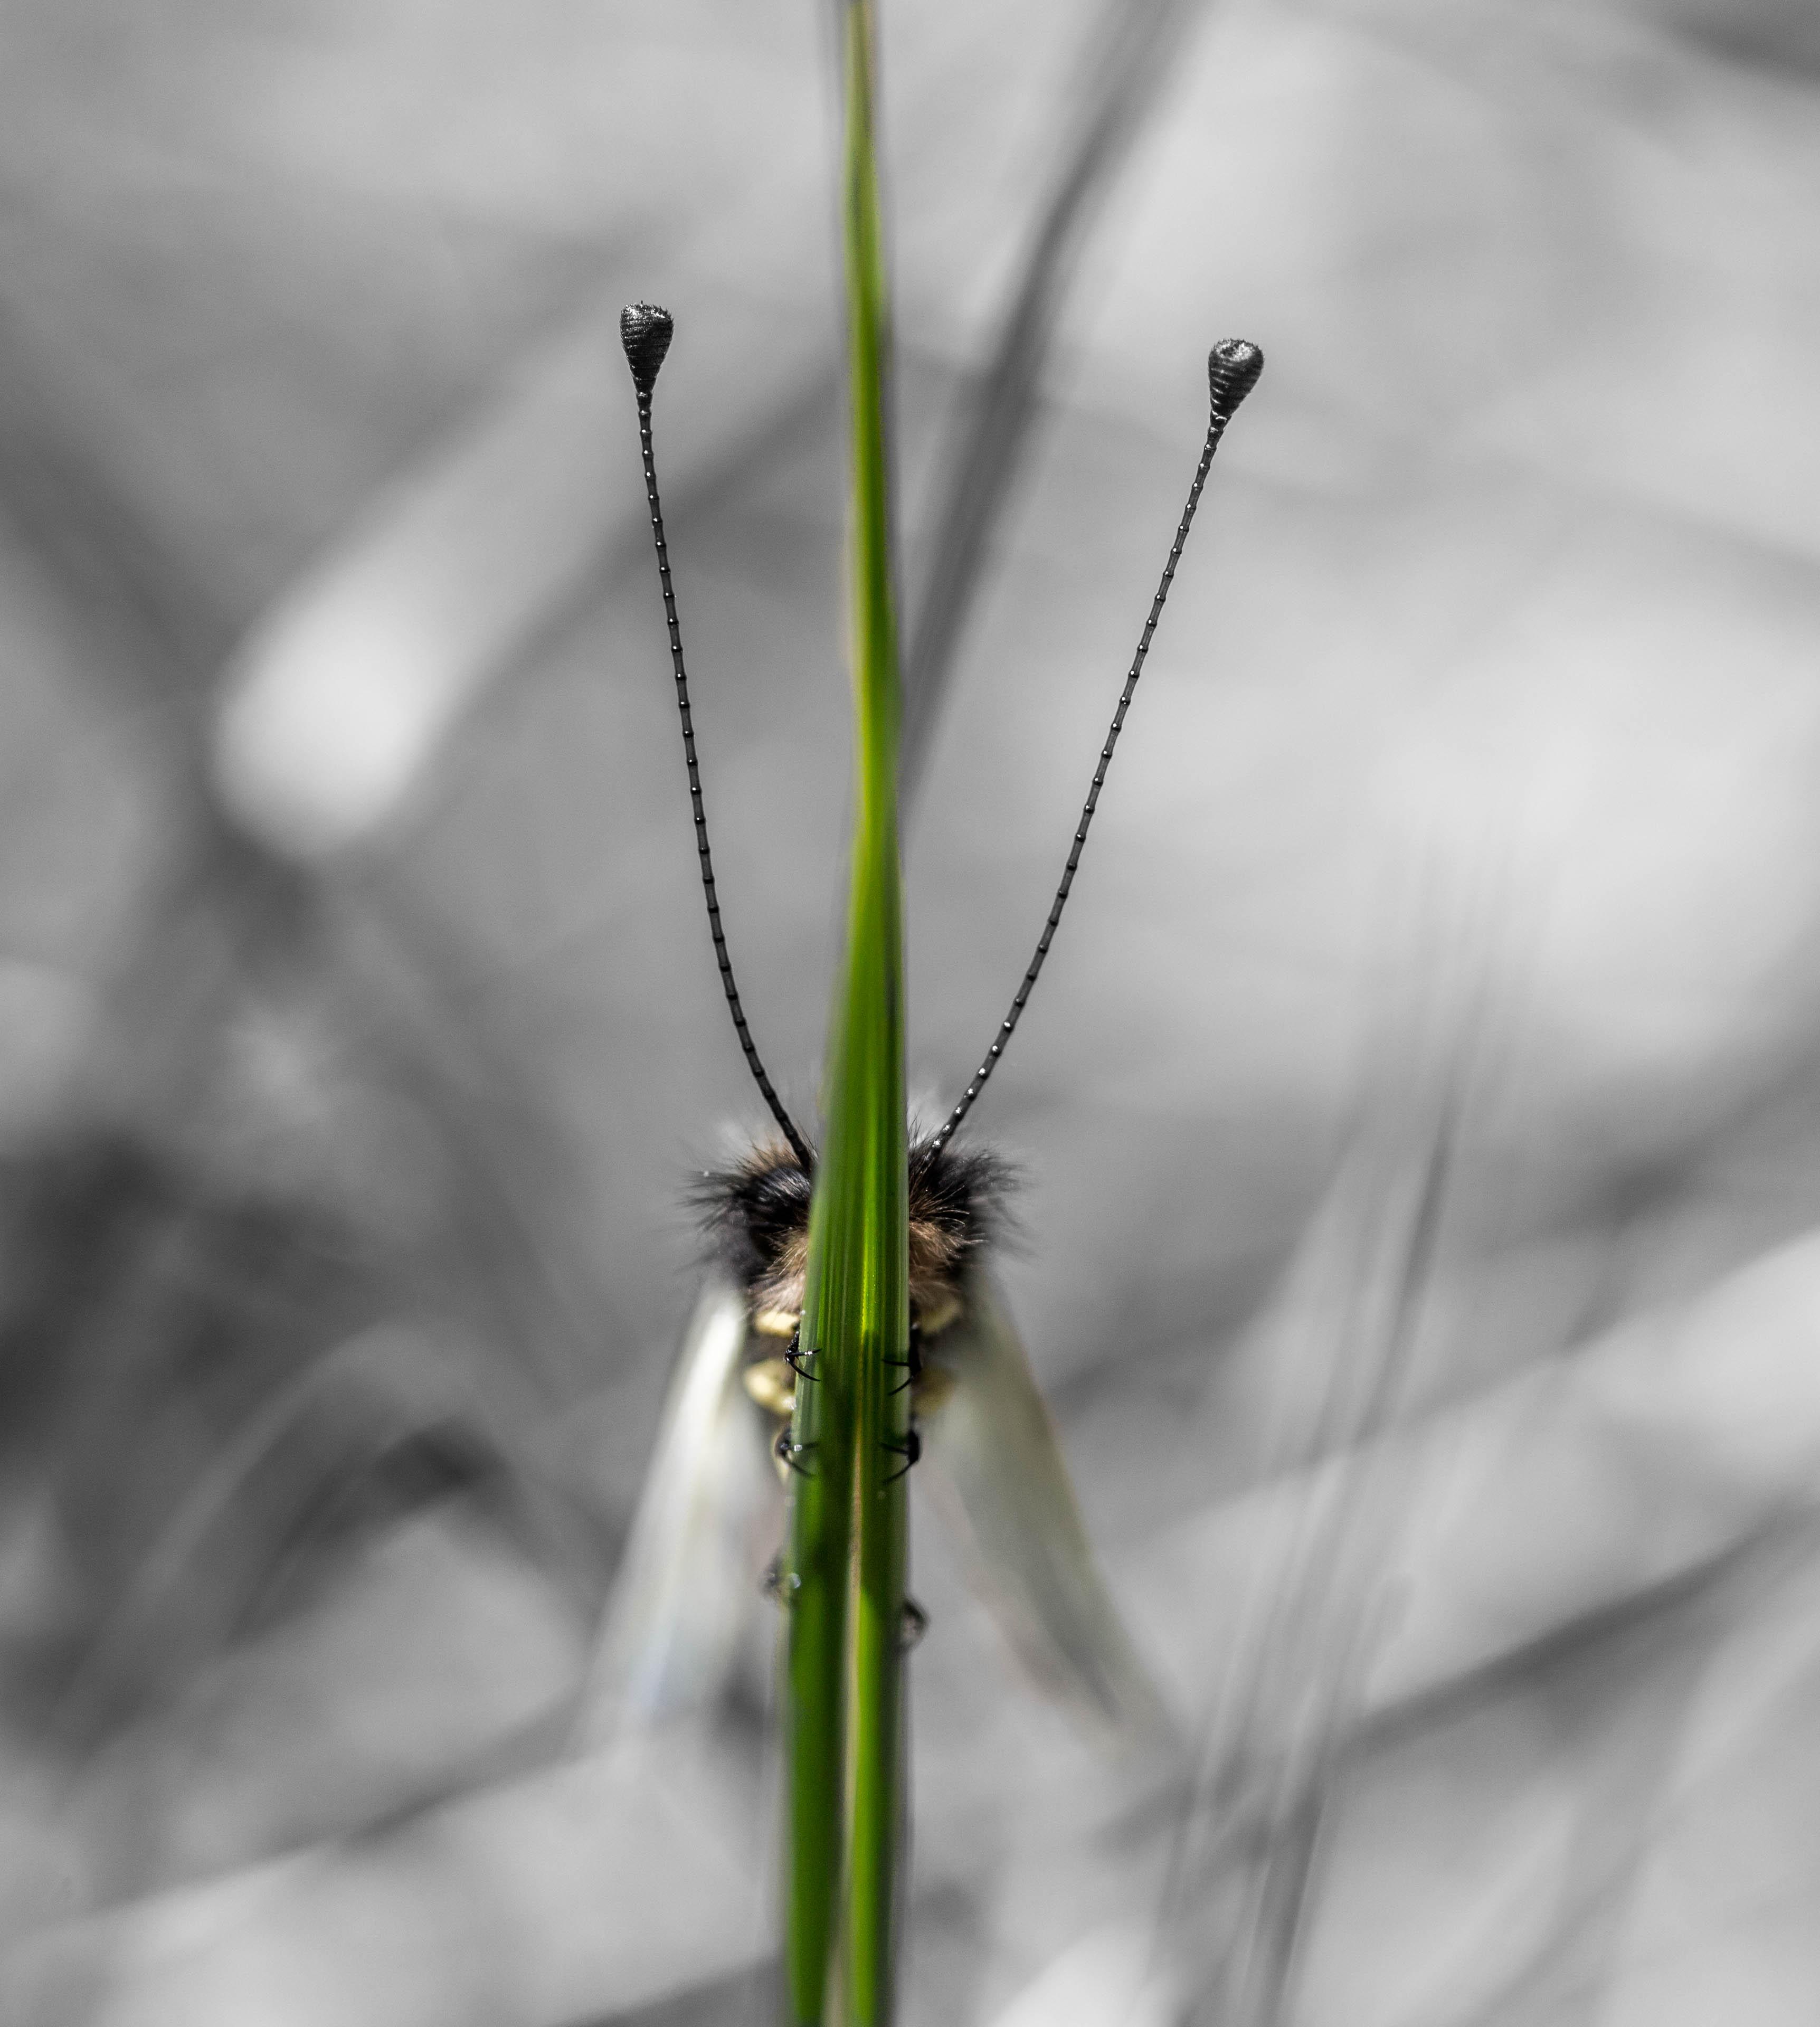 Ascalaphe (Libelloides lacteus)